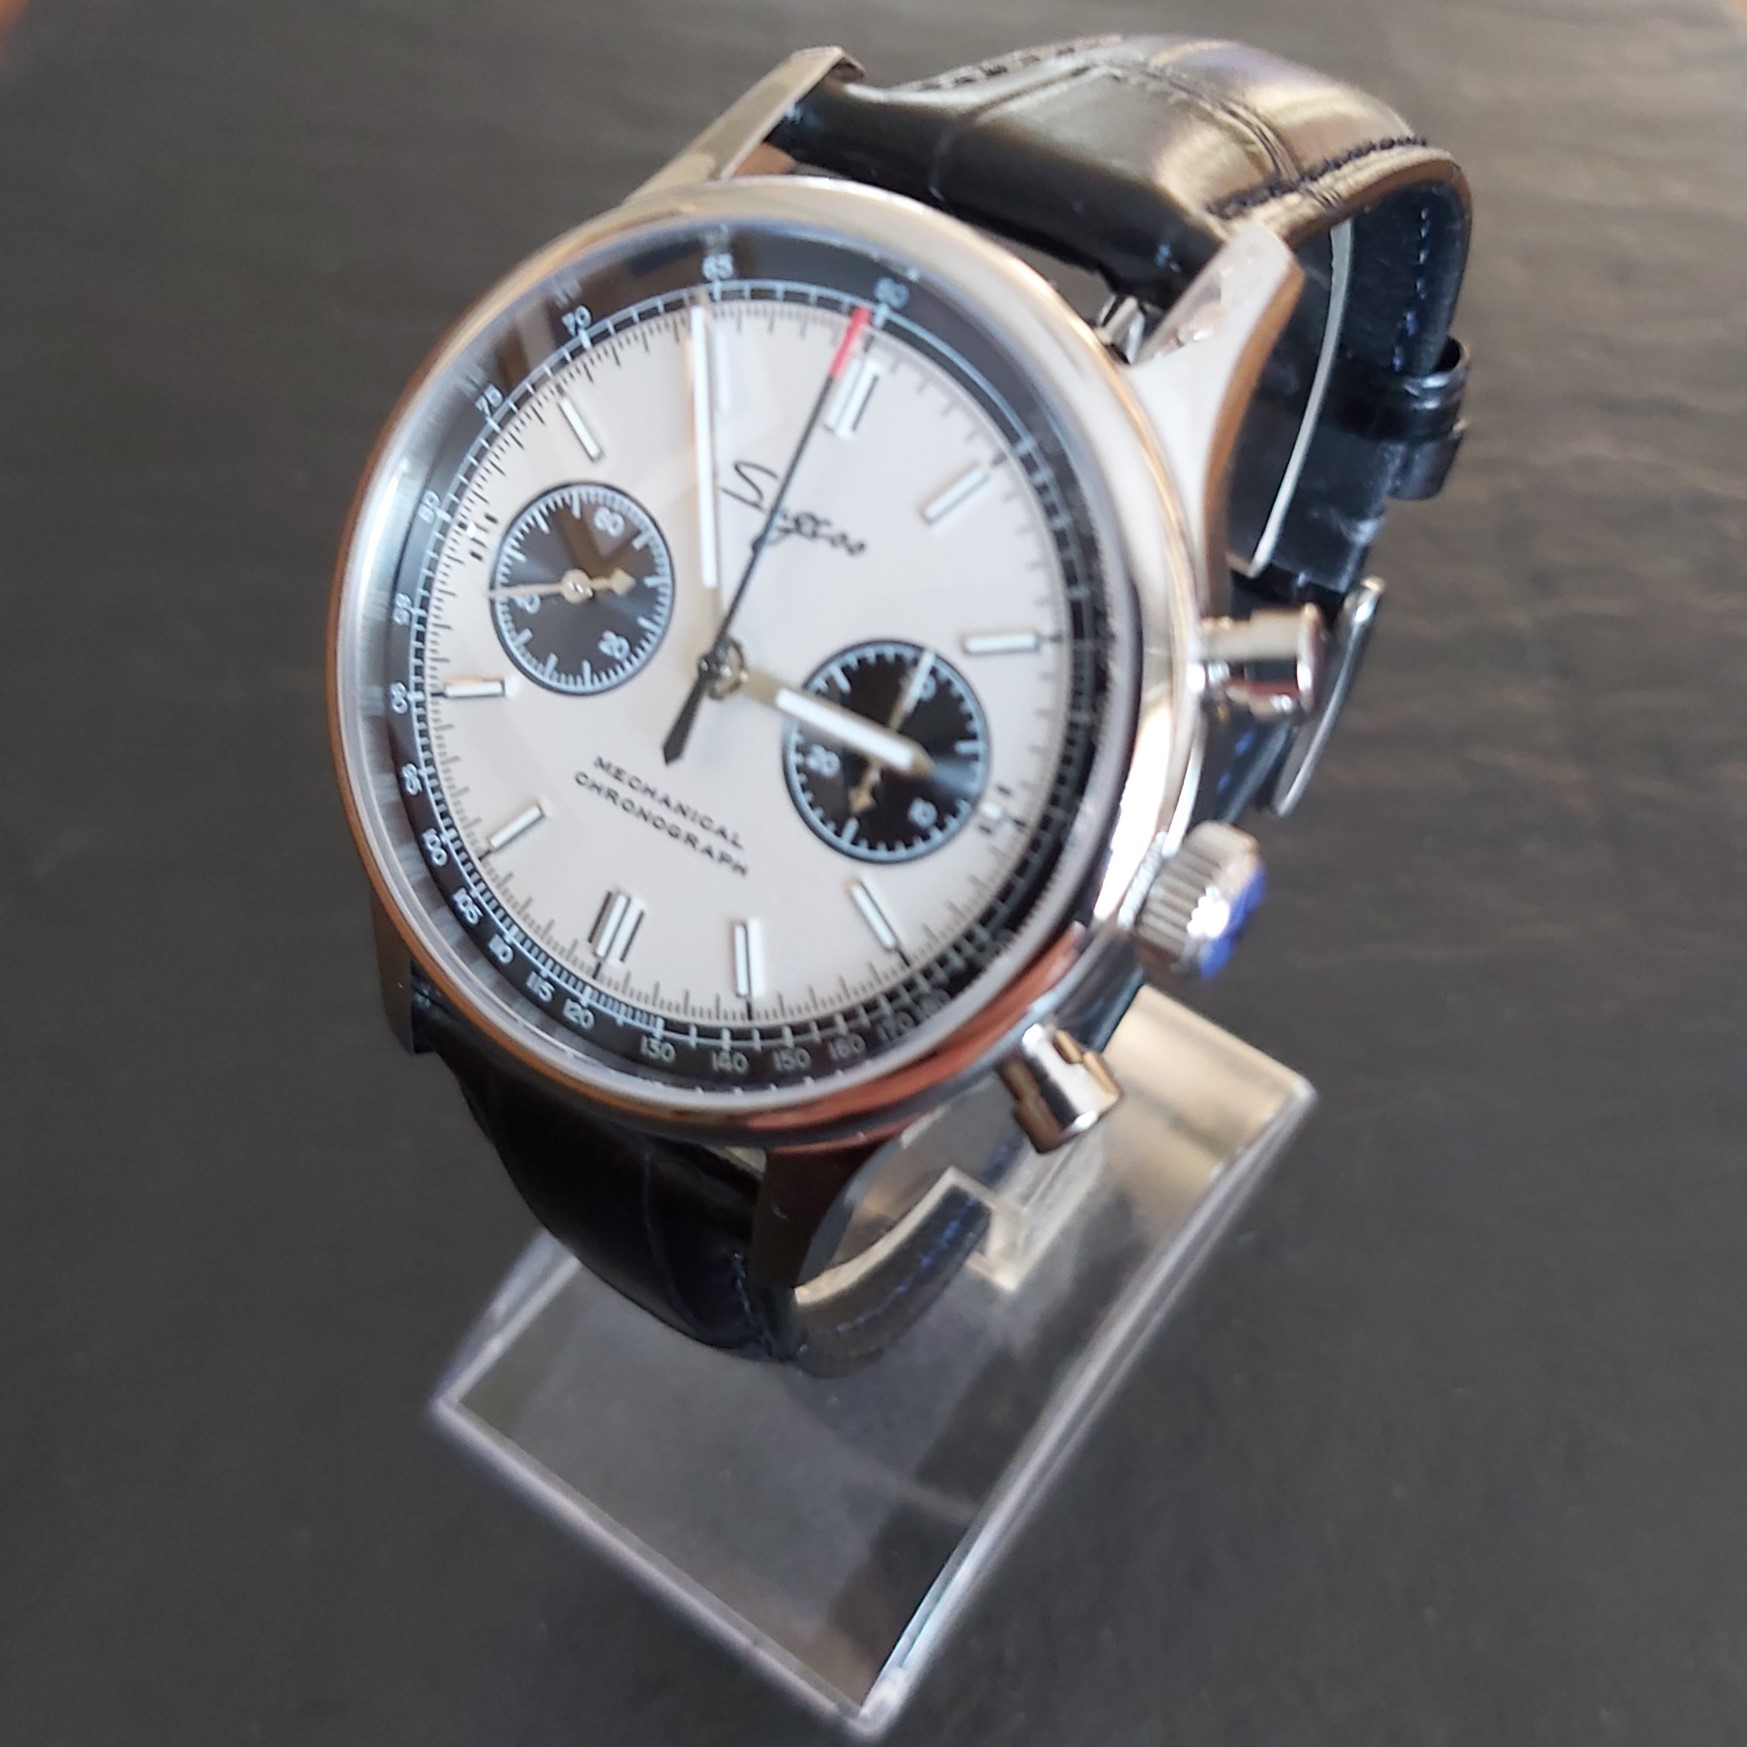 Sugess Chrono Heritage SUPANK004SN: White & Silver 40mm